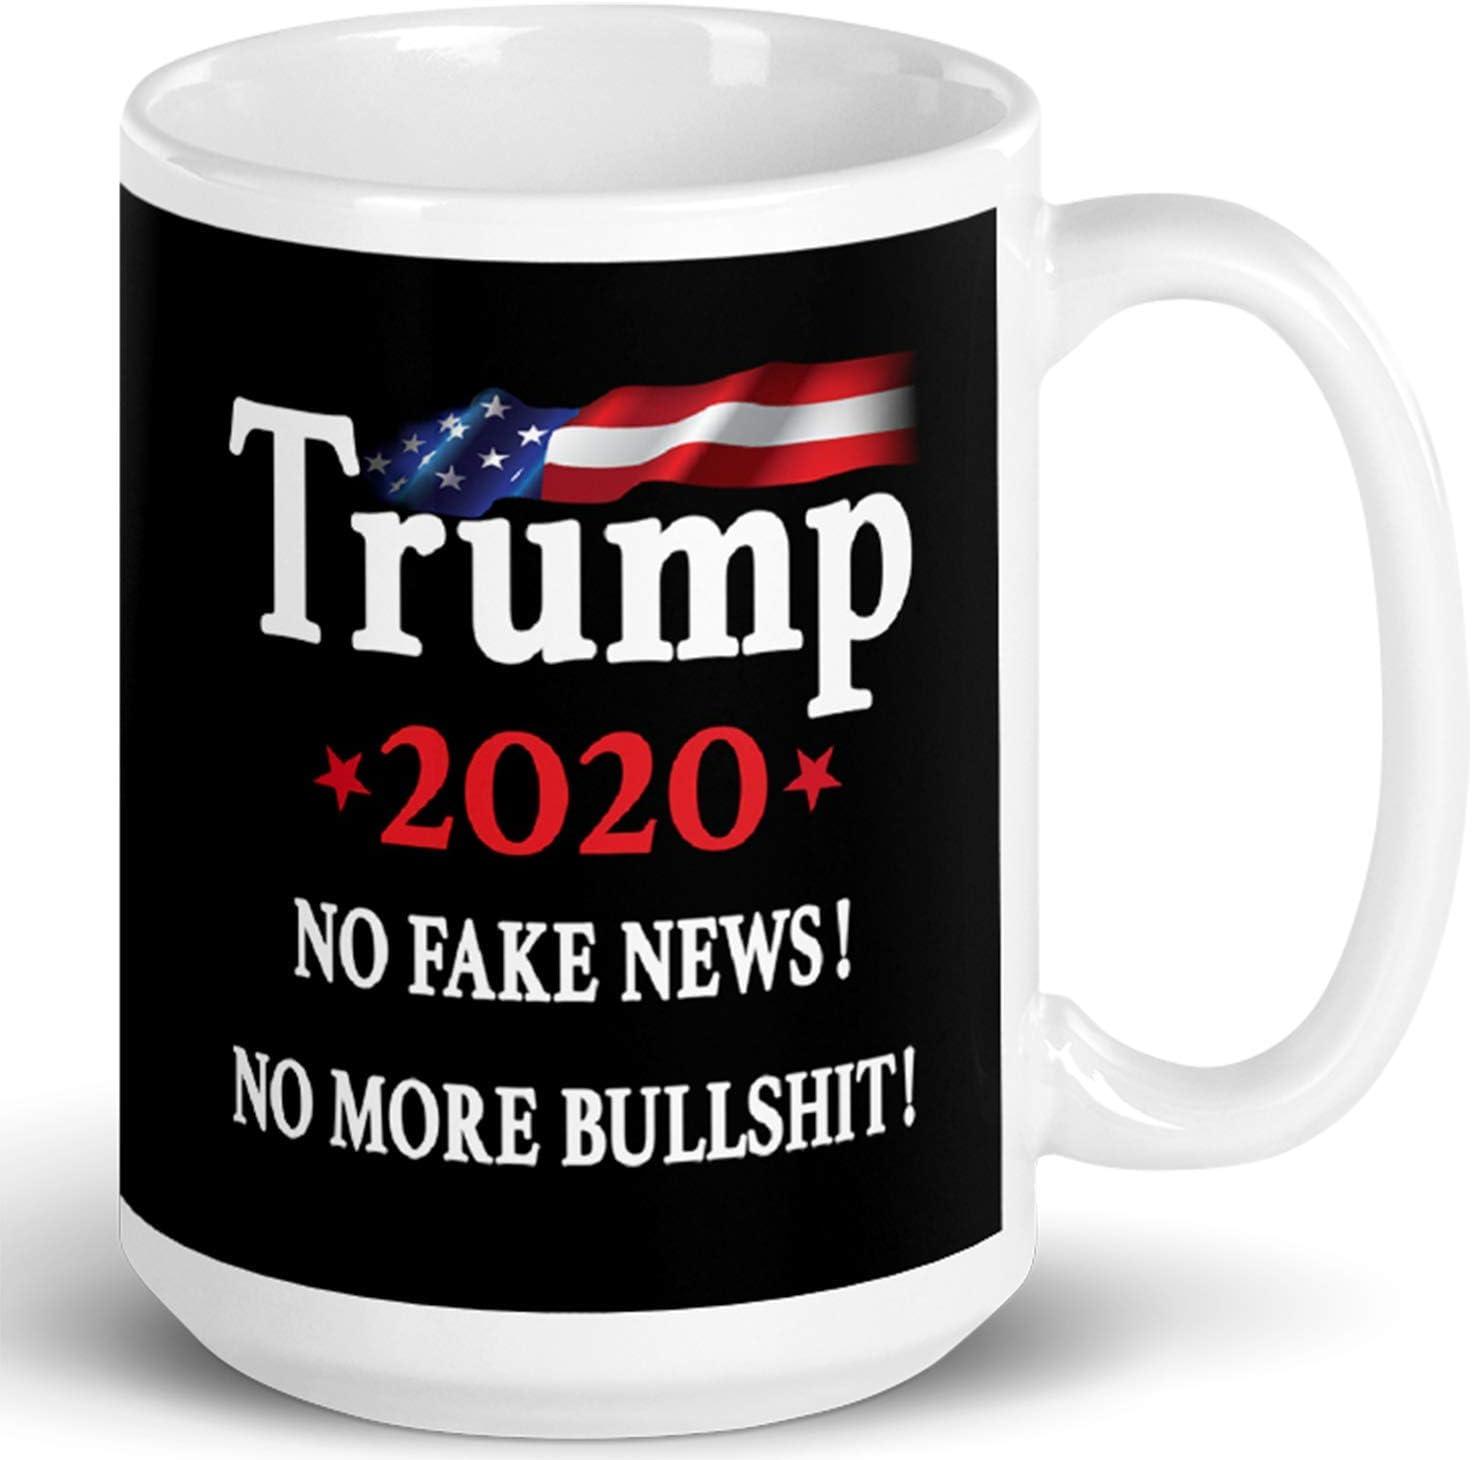 Funny Donald Trump President 2020 Coffee Mug Men Women Political Gift Feelings